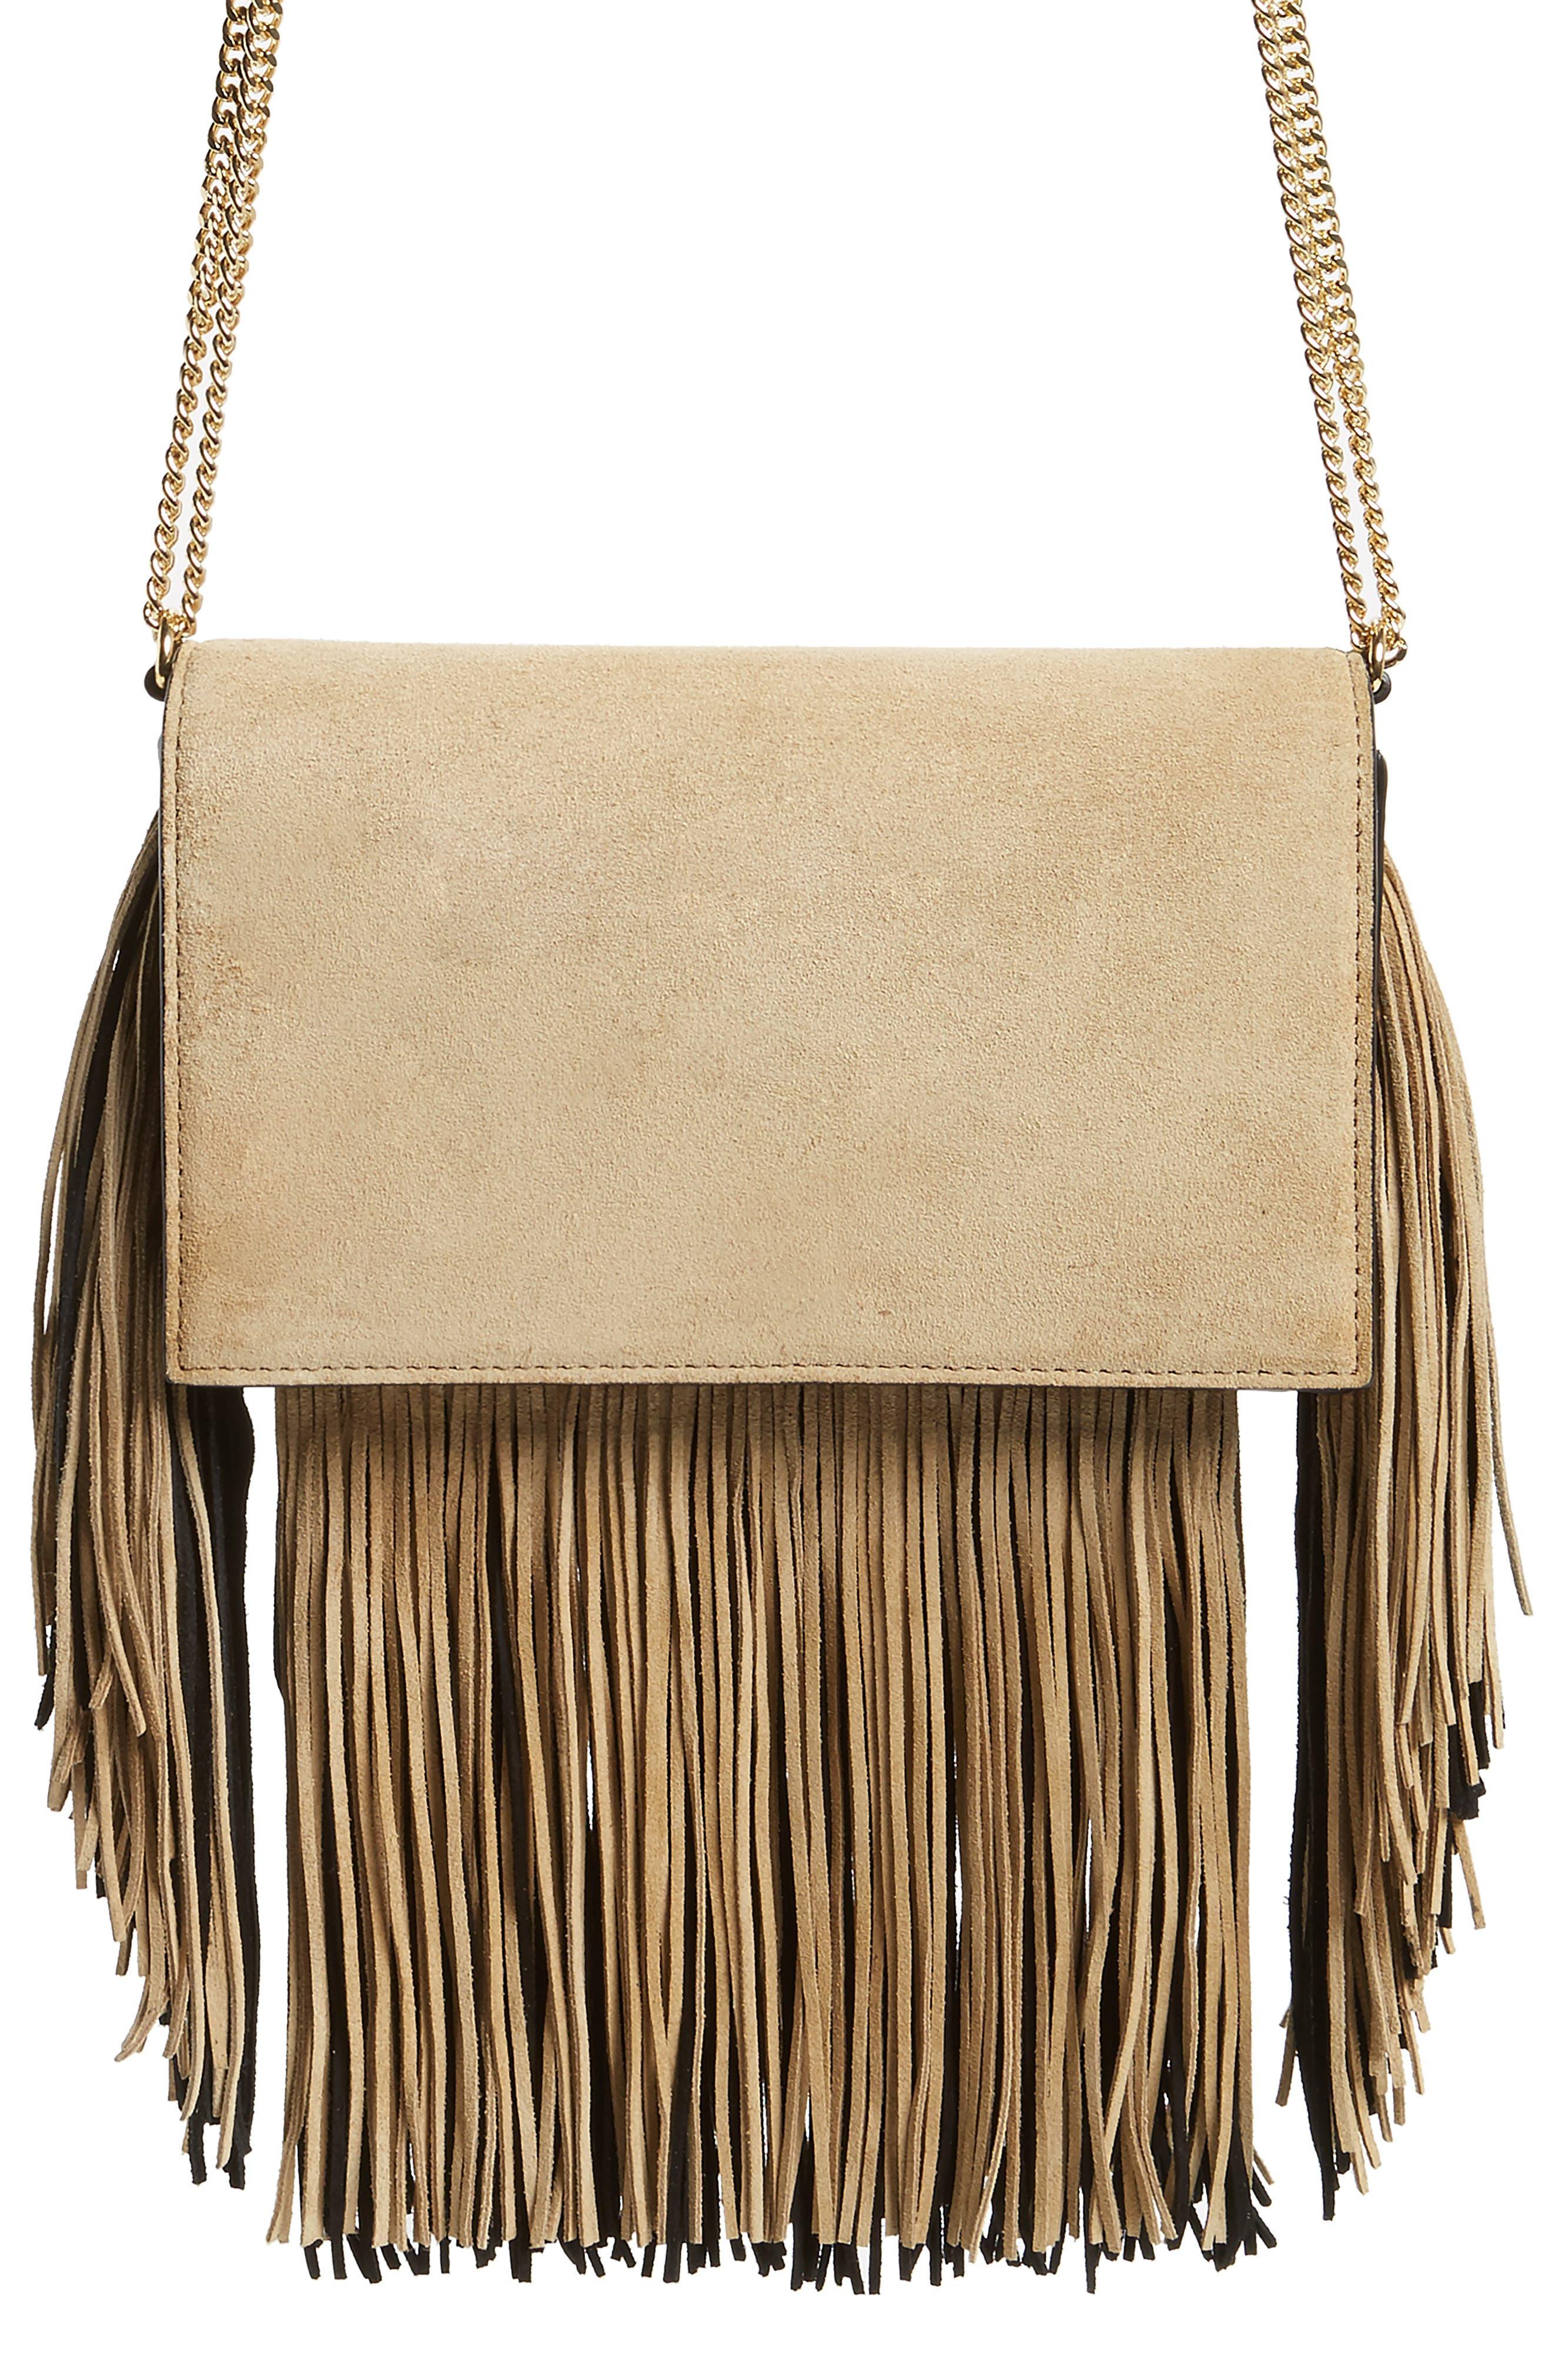 Fringe Soirée Suede Convertible Crossbody Bag,                         Main,                         color, 250